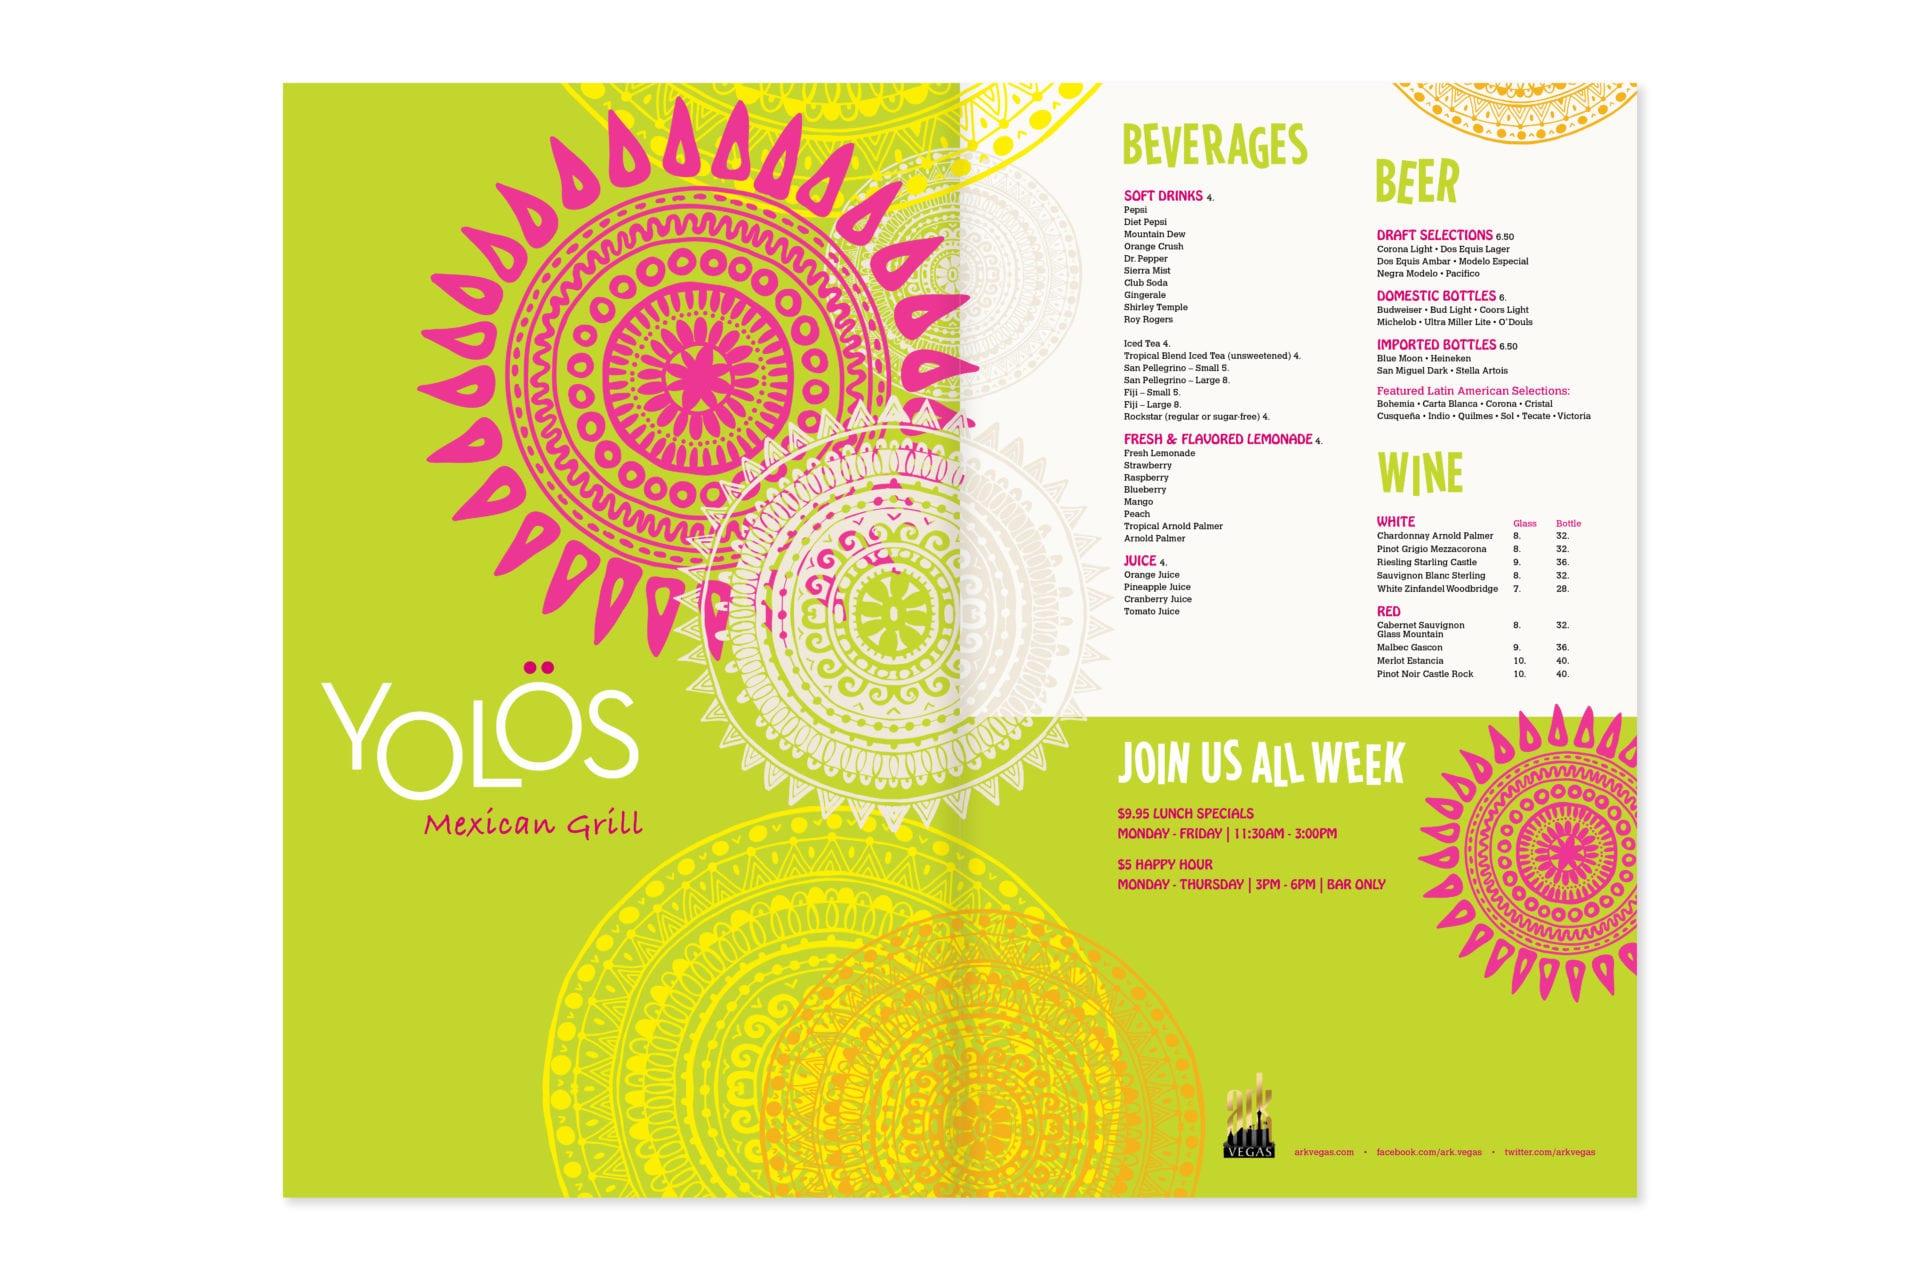 Yolos Mexican Grill menu design, cover